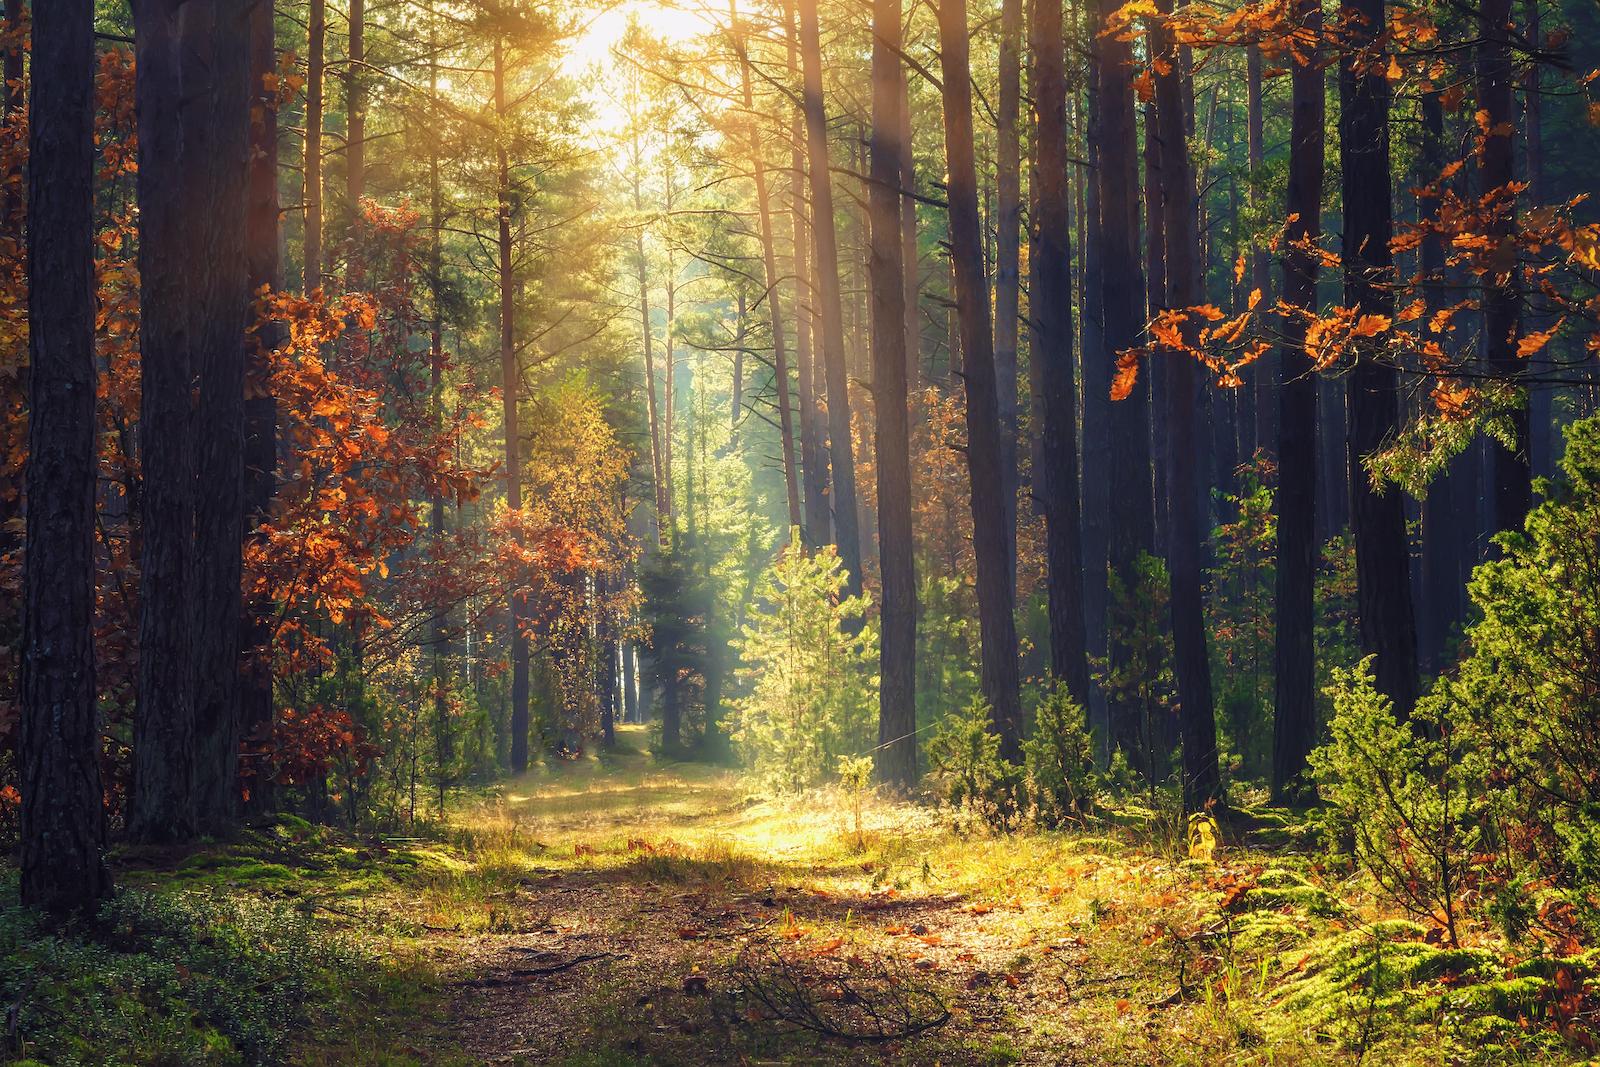 Balancing Dark and Light - An Autmn Equinox Meditation